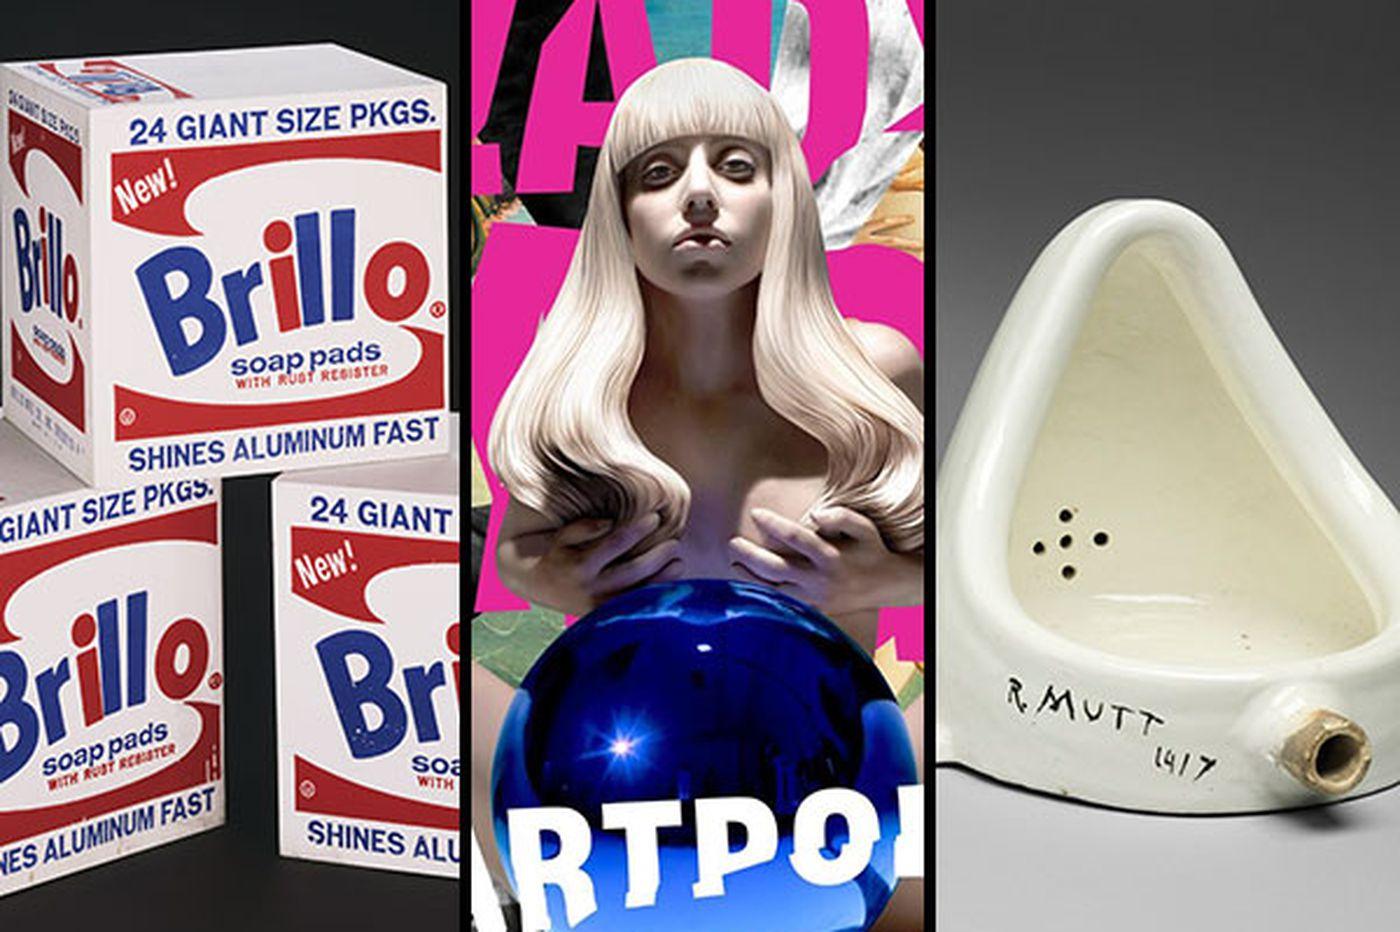 ARTPOP meets Pop art: Influences on Lady Gaga's new album